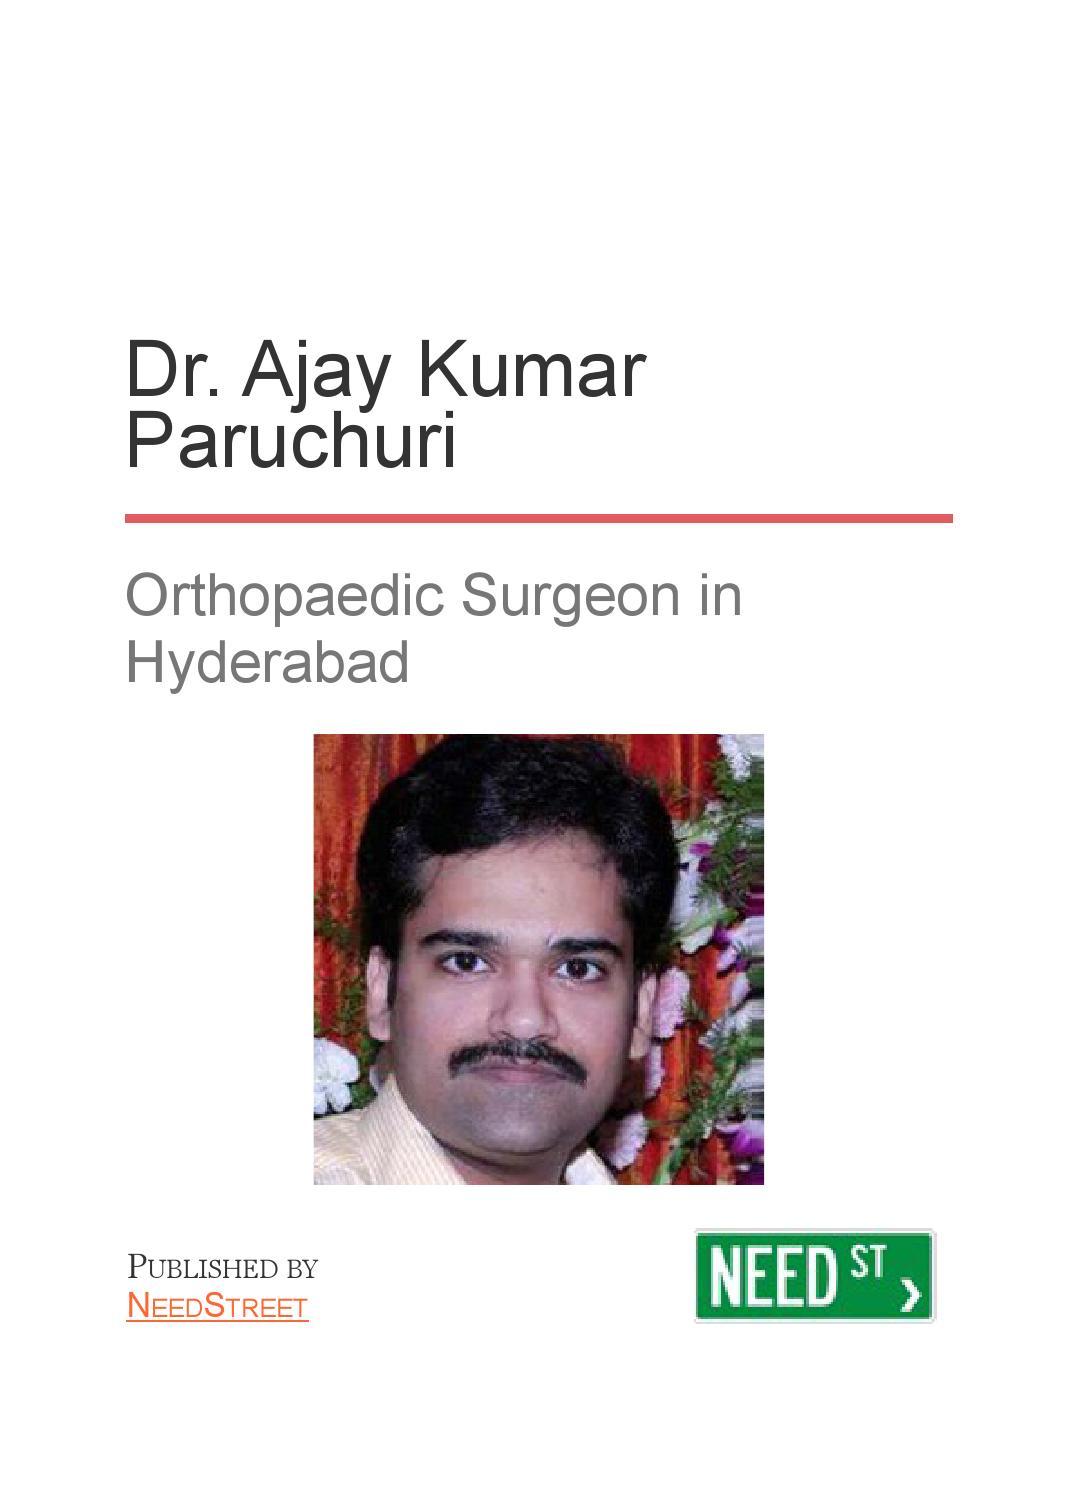 Dr  Ajay Kumar Paruchuri - Orthopaedic Surgeon in Hyderabad